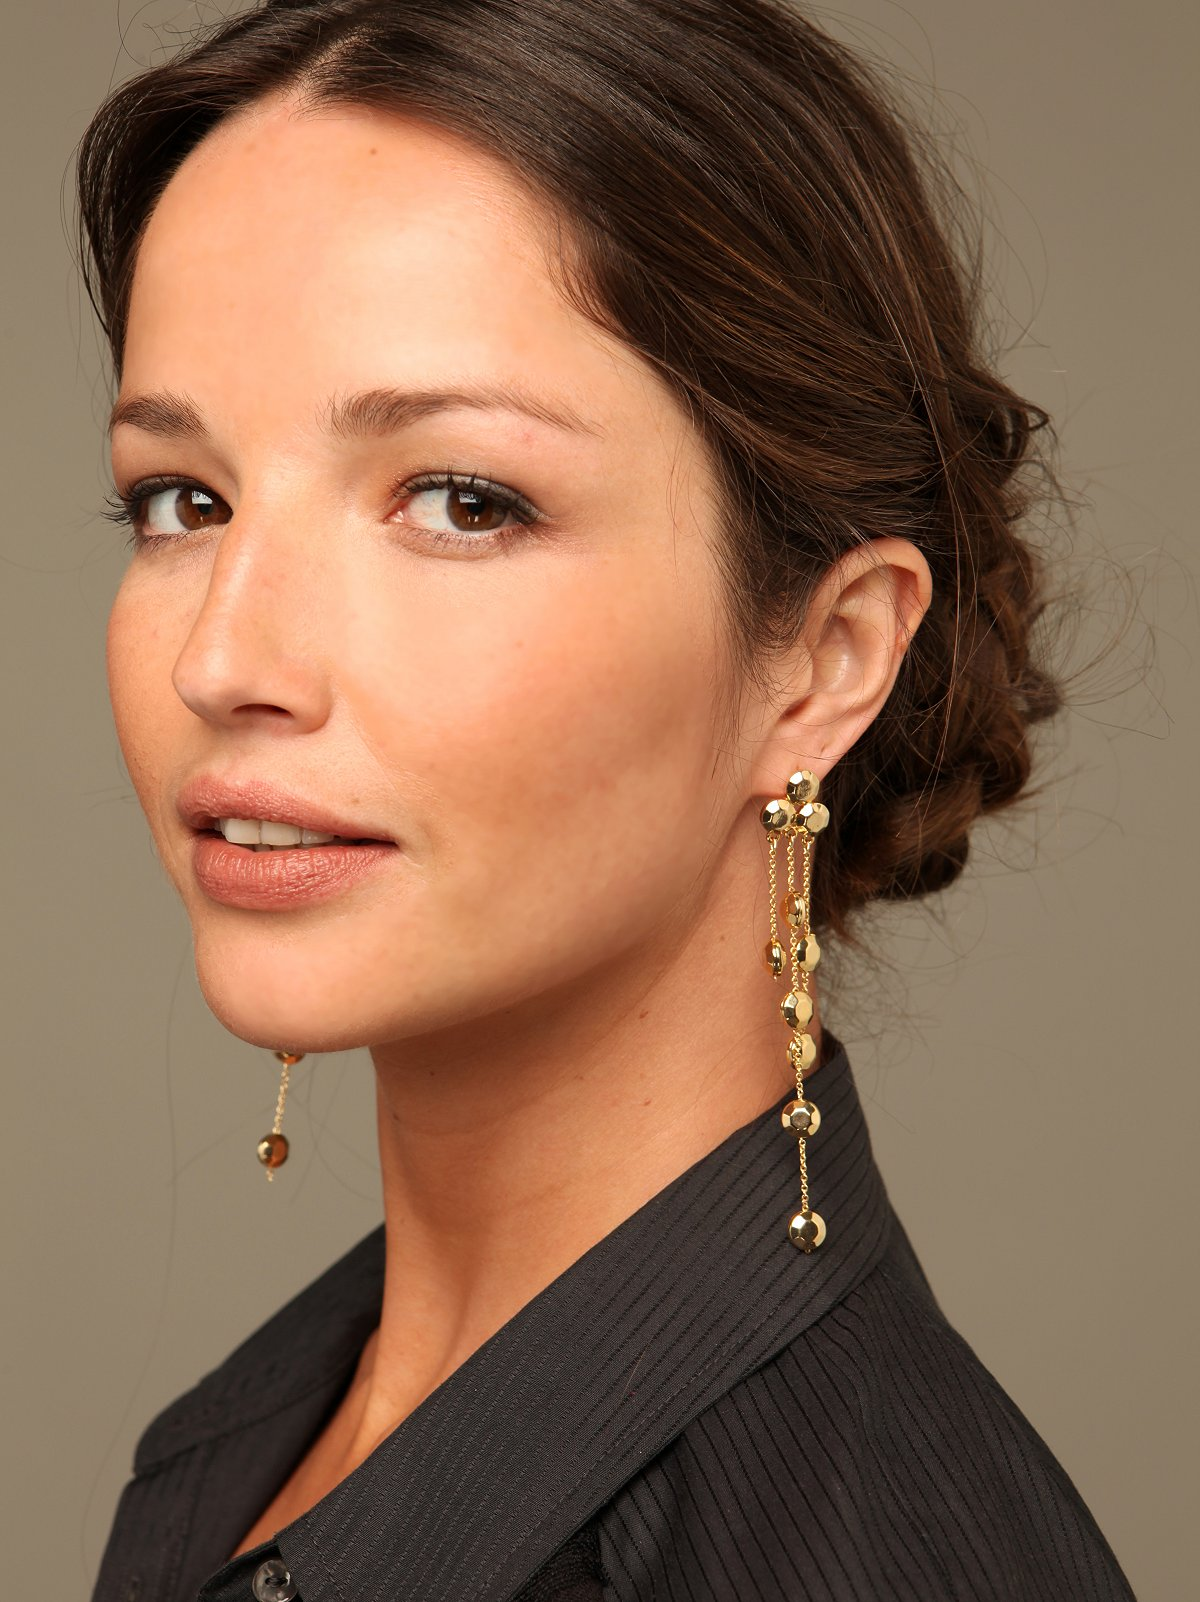 Dripping Studs Earrings